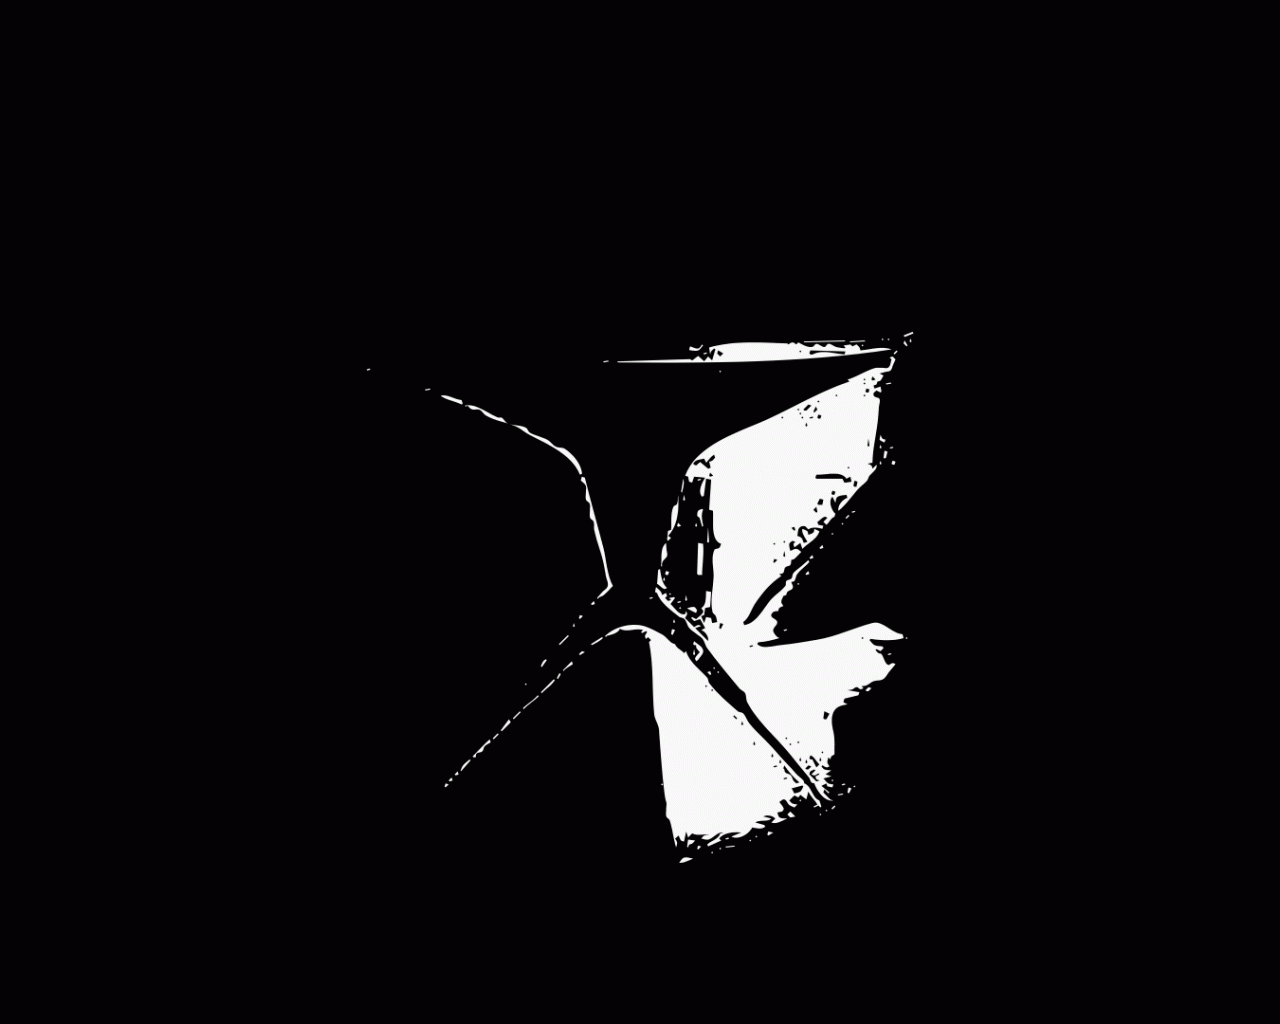 Free Download Clone Trooper Wallpaper Hd Clone Trooper Wallpaper 1920x1080 For Your Desktop Mobile Tablet Explore 73 Star Wars Clone Trooper Wallpaper Clone Trooper Wallpaper Shadow Trooper Wallpaper Star